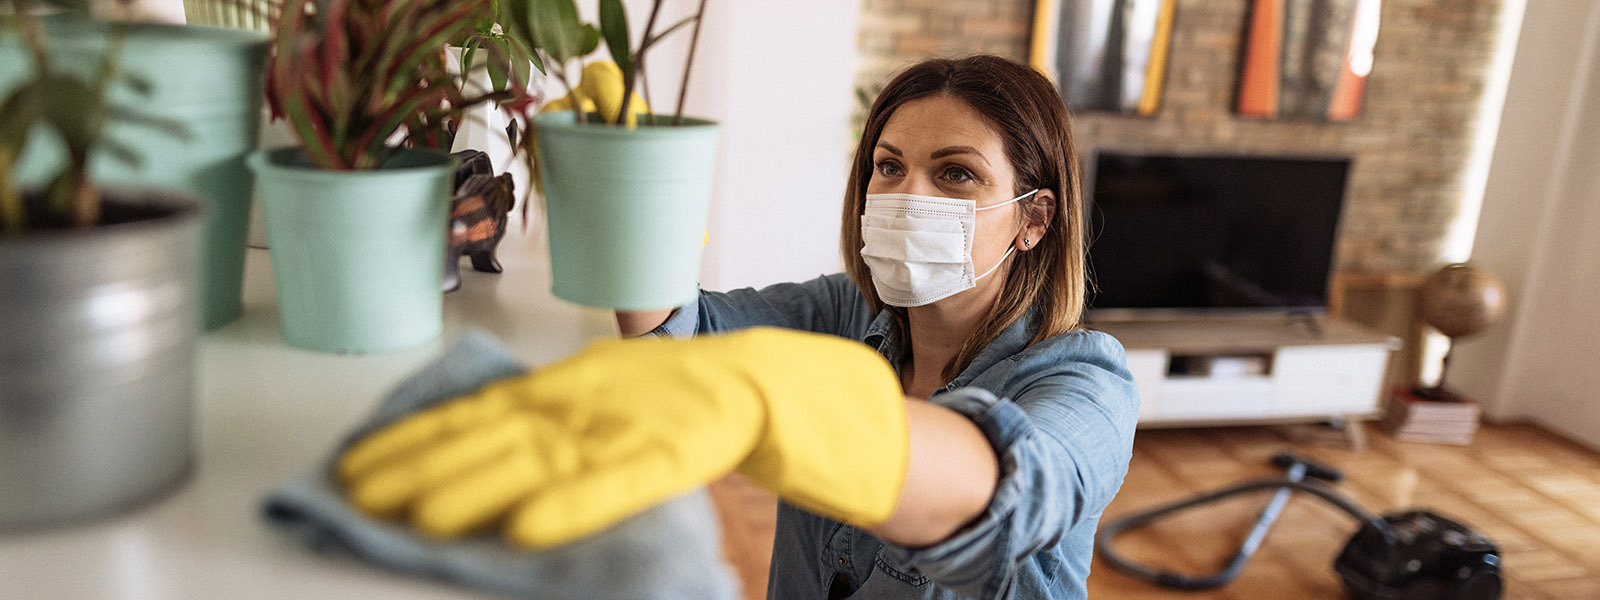 A woman cleans a shelf